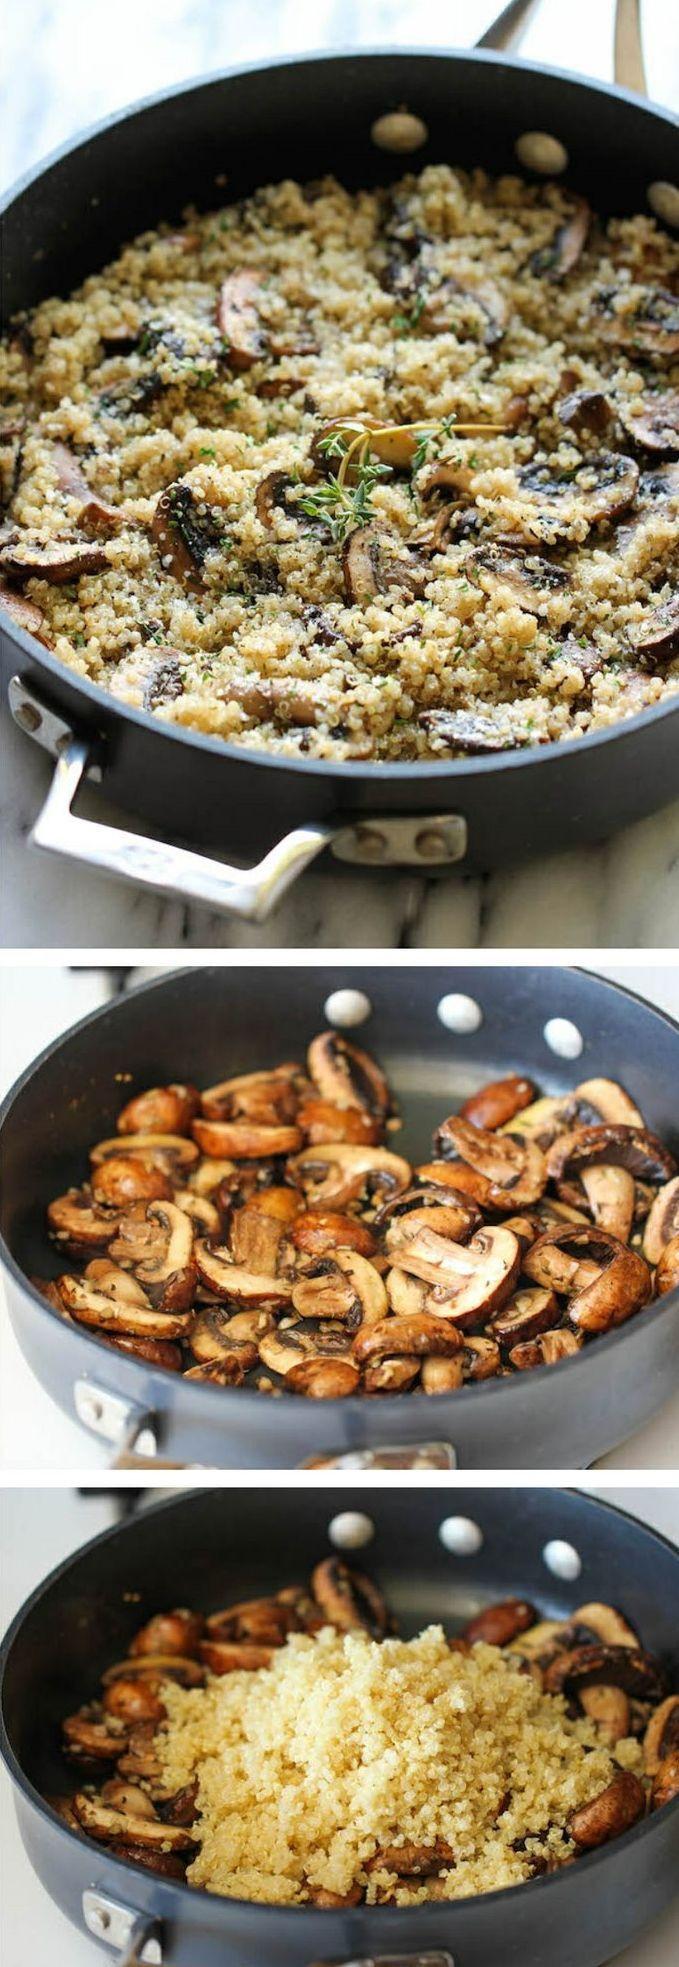 Healthy Mushroom Side Dish  Best 25 Couscous recipes ideas on Pinterest